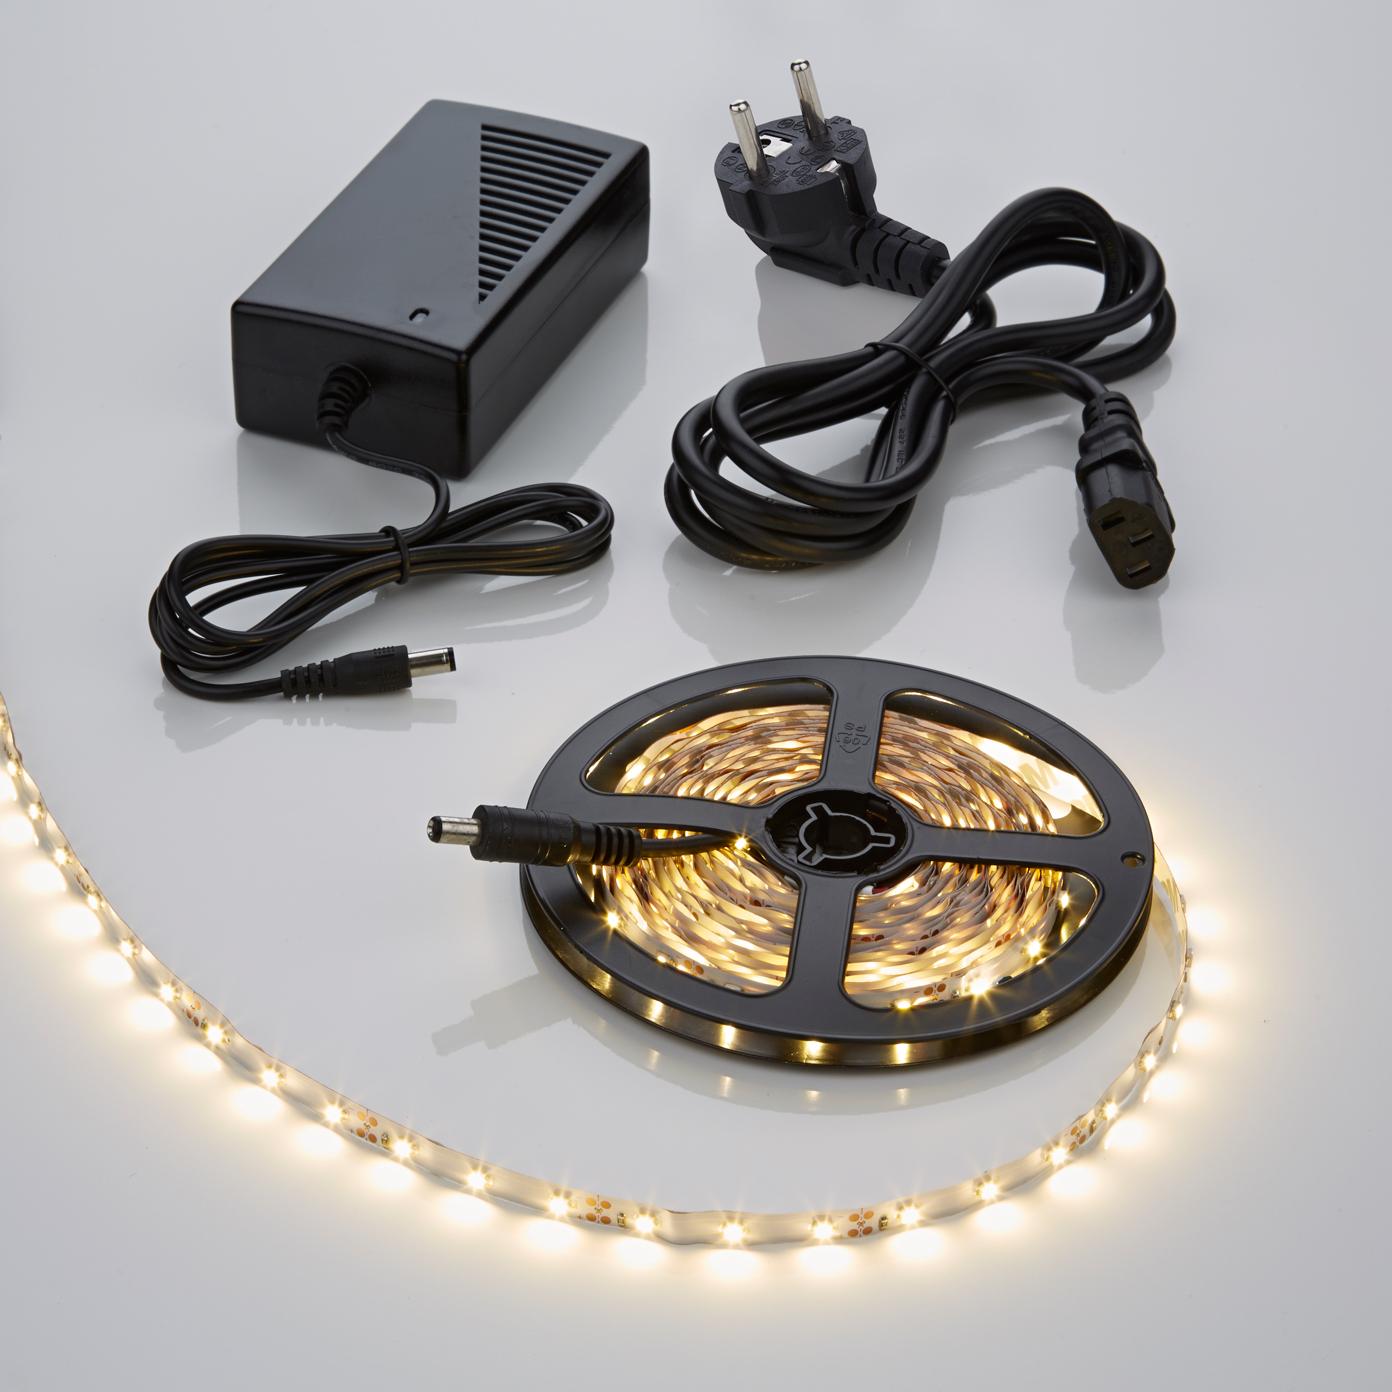 Strisce LED 3528 5 Metri Bianco Caldo